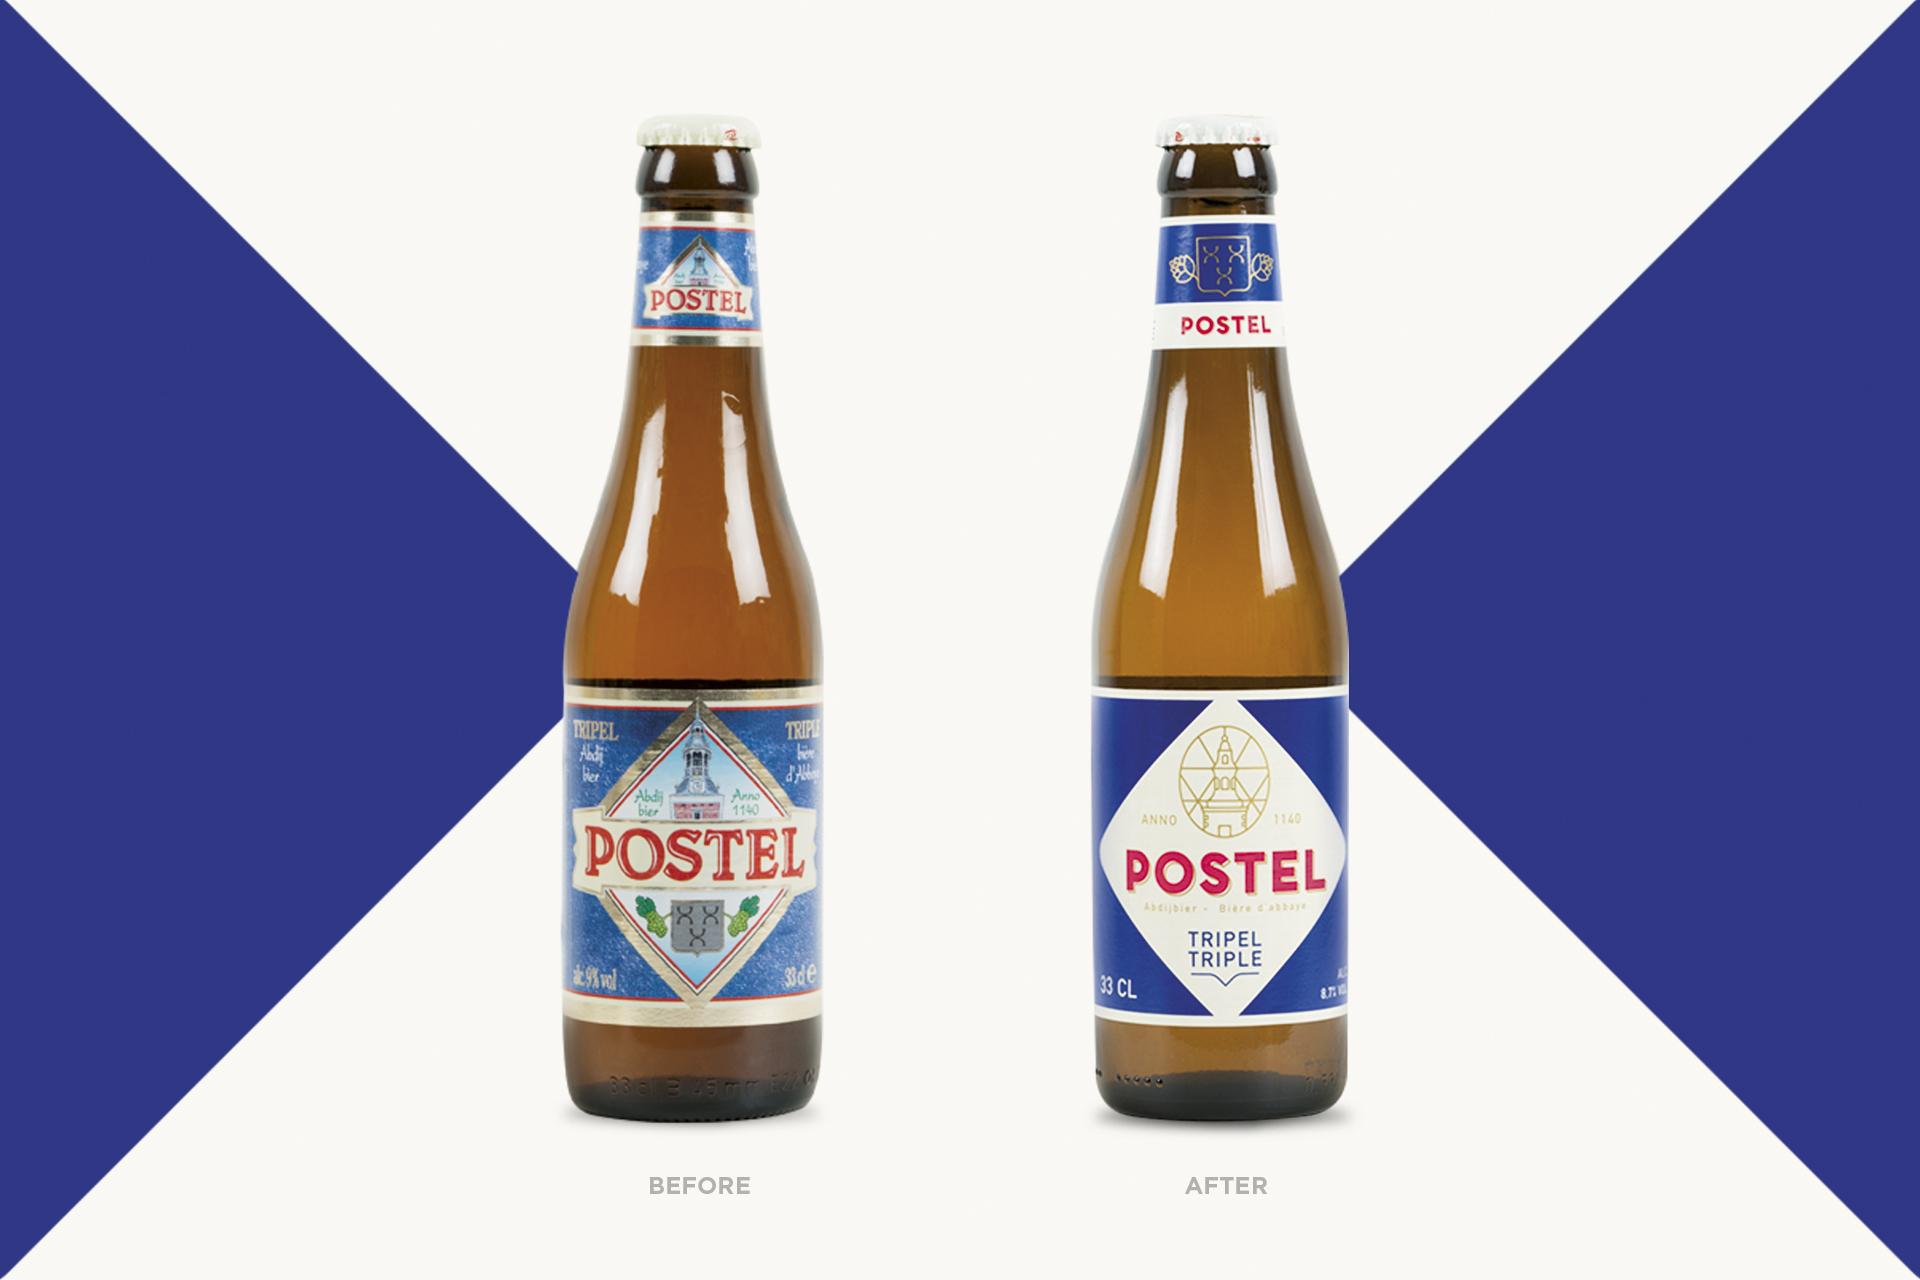 DesignRepublic Rejuvenates Postel Abbey Beer